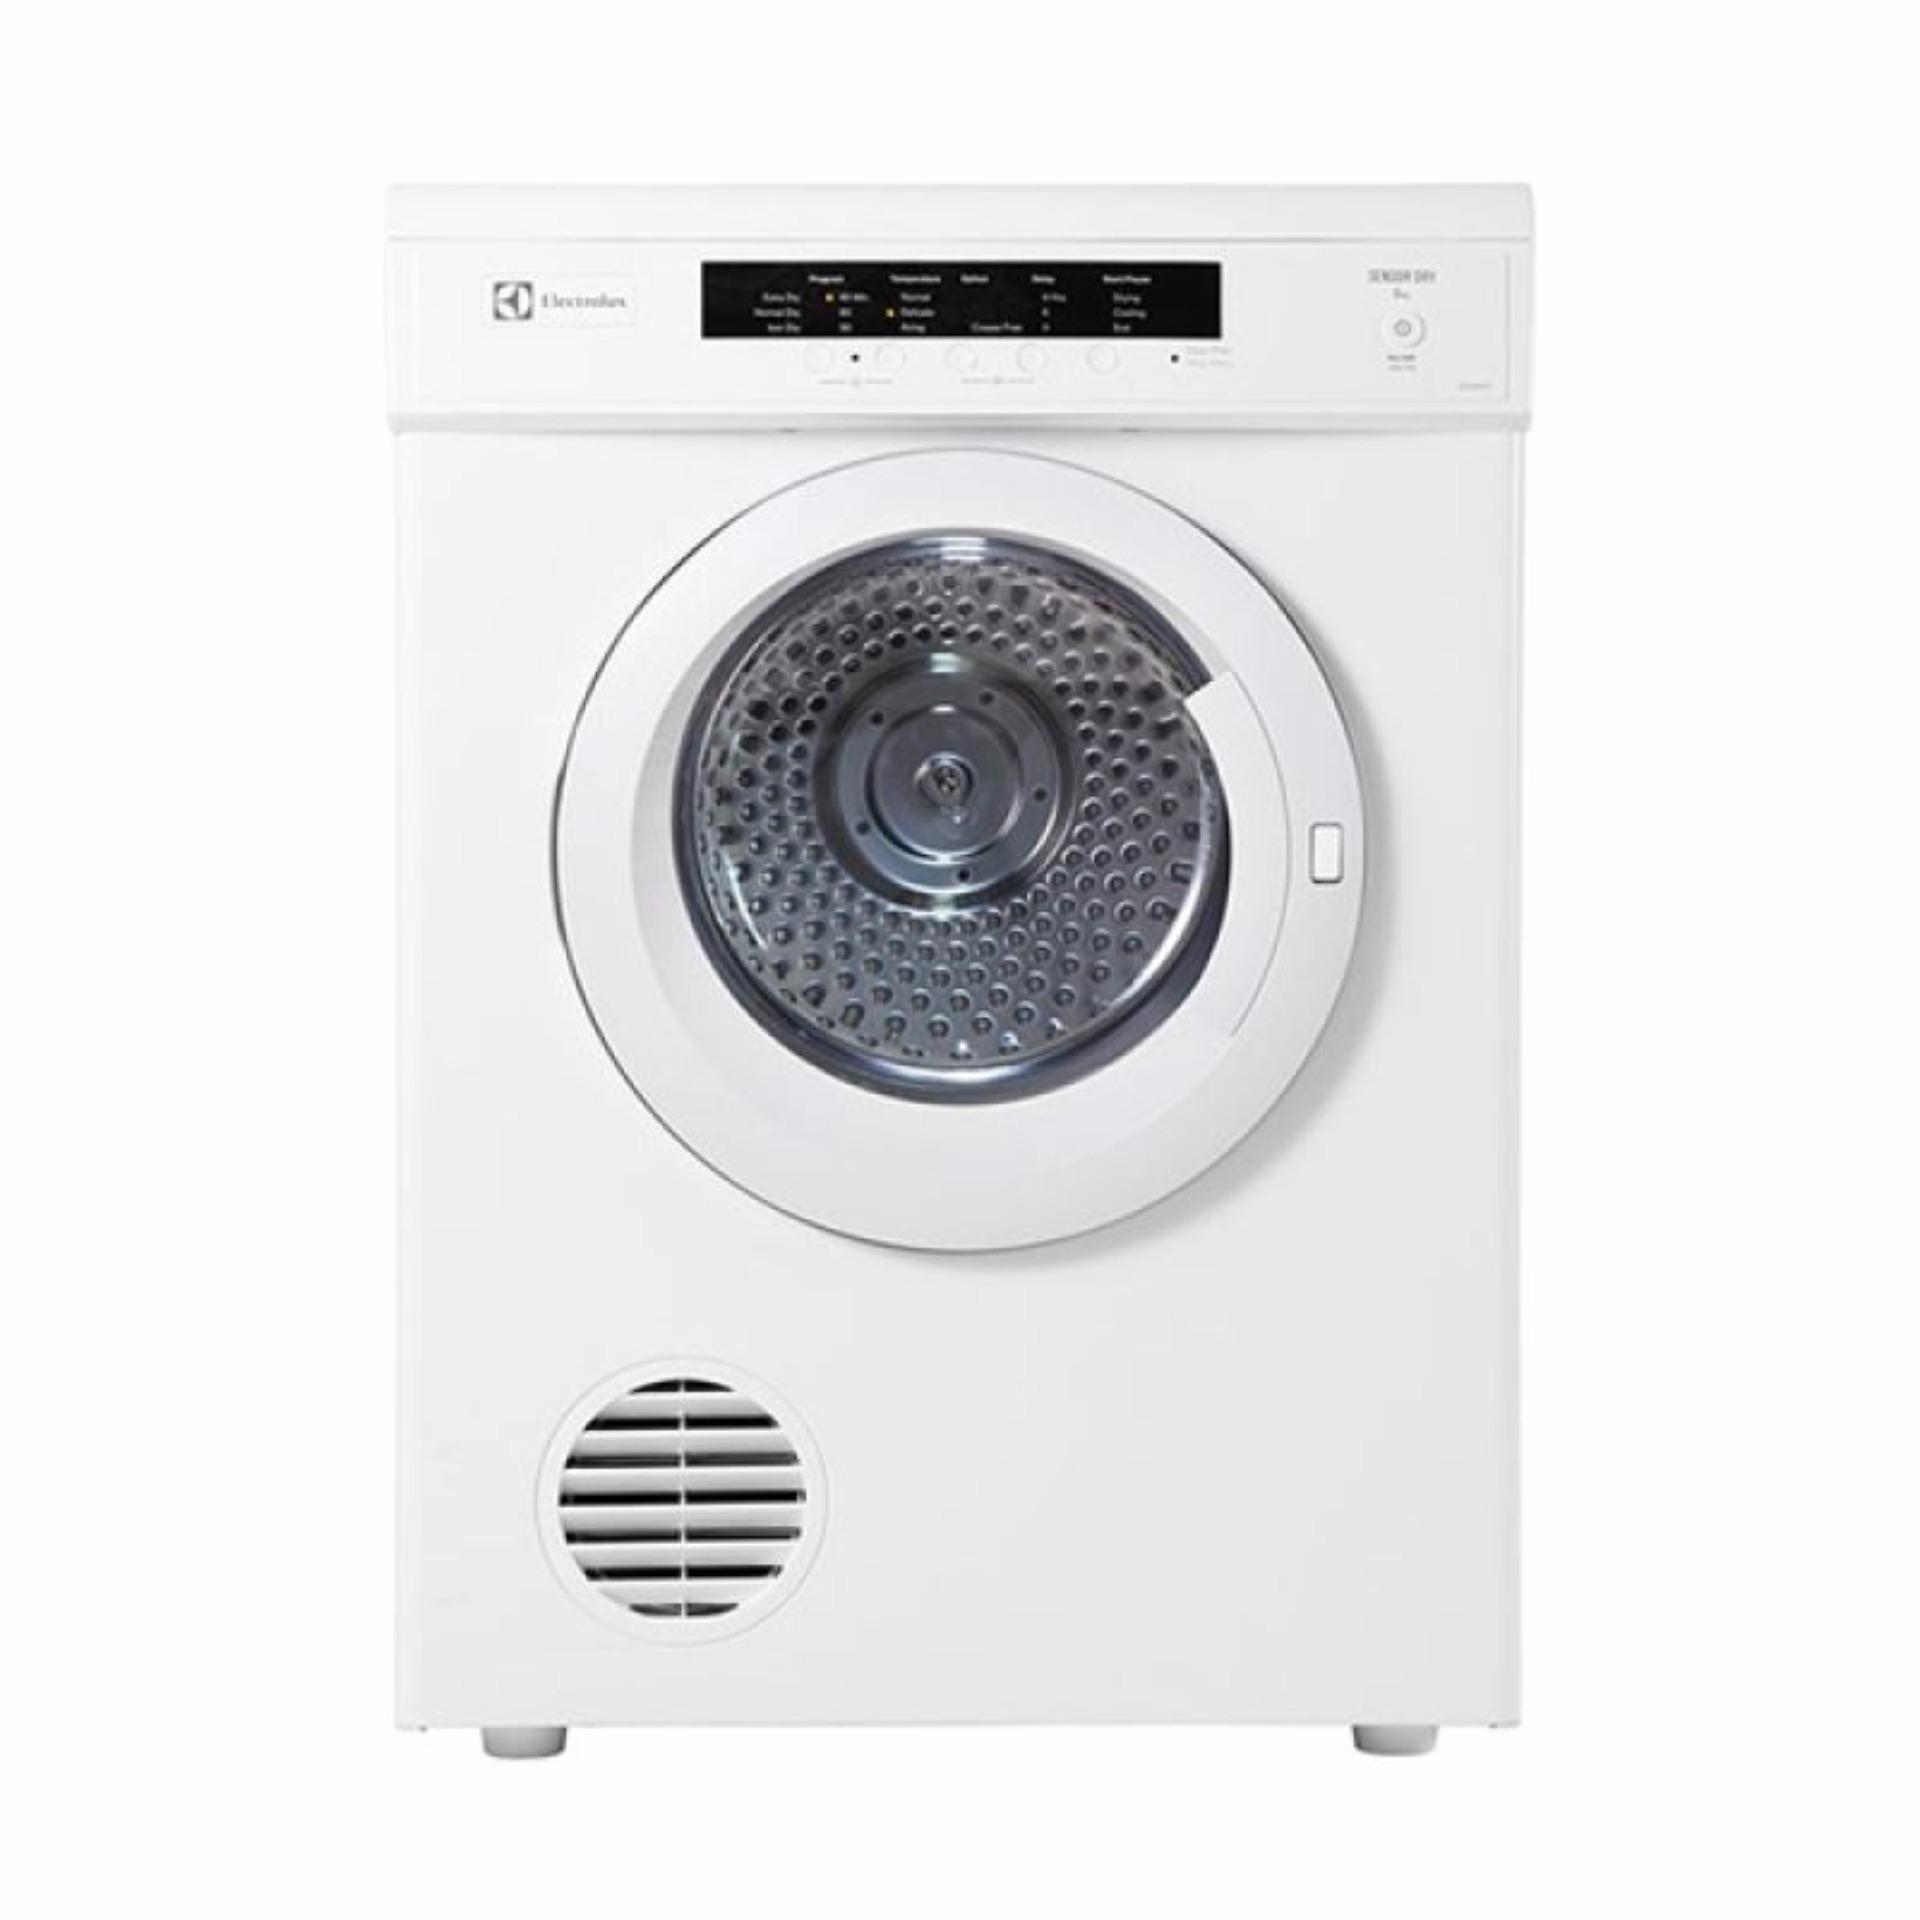 Electrolux Dryer EDV6001 free ongkir jabodetabek